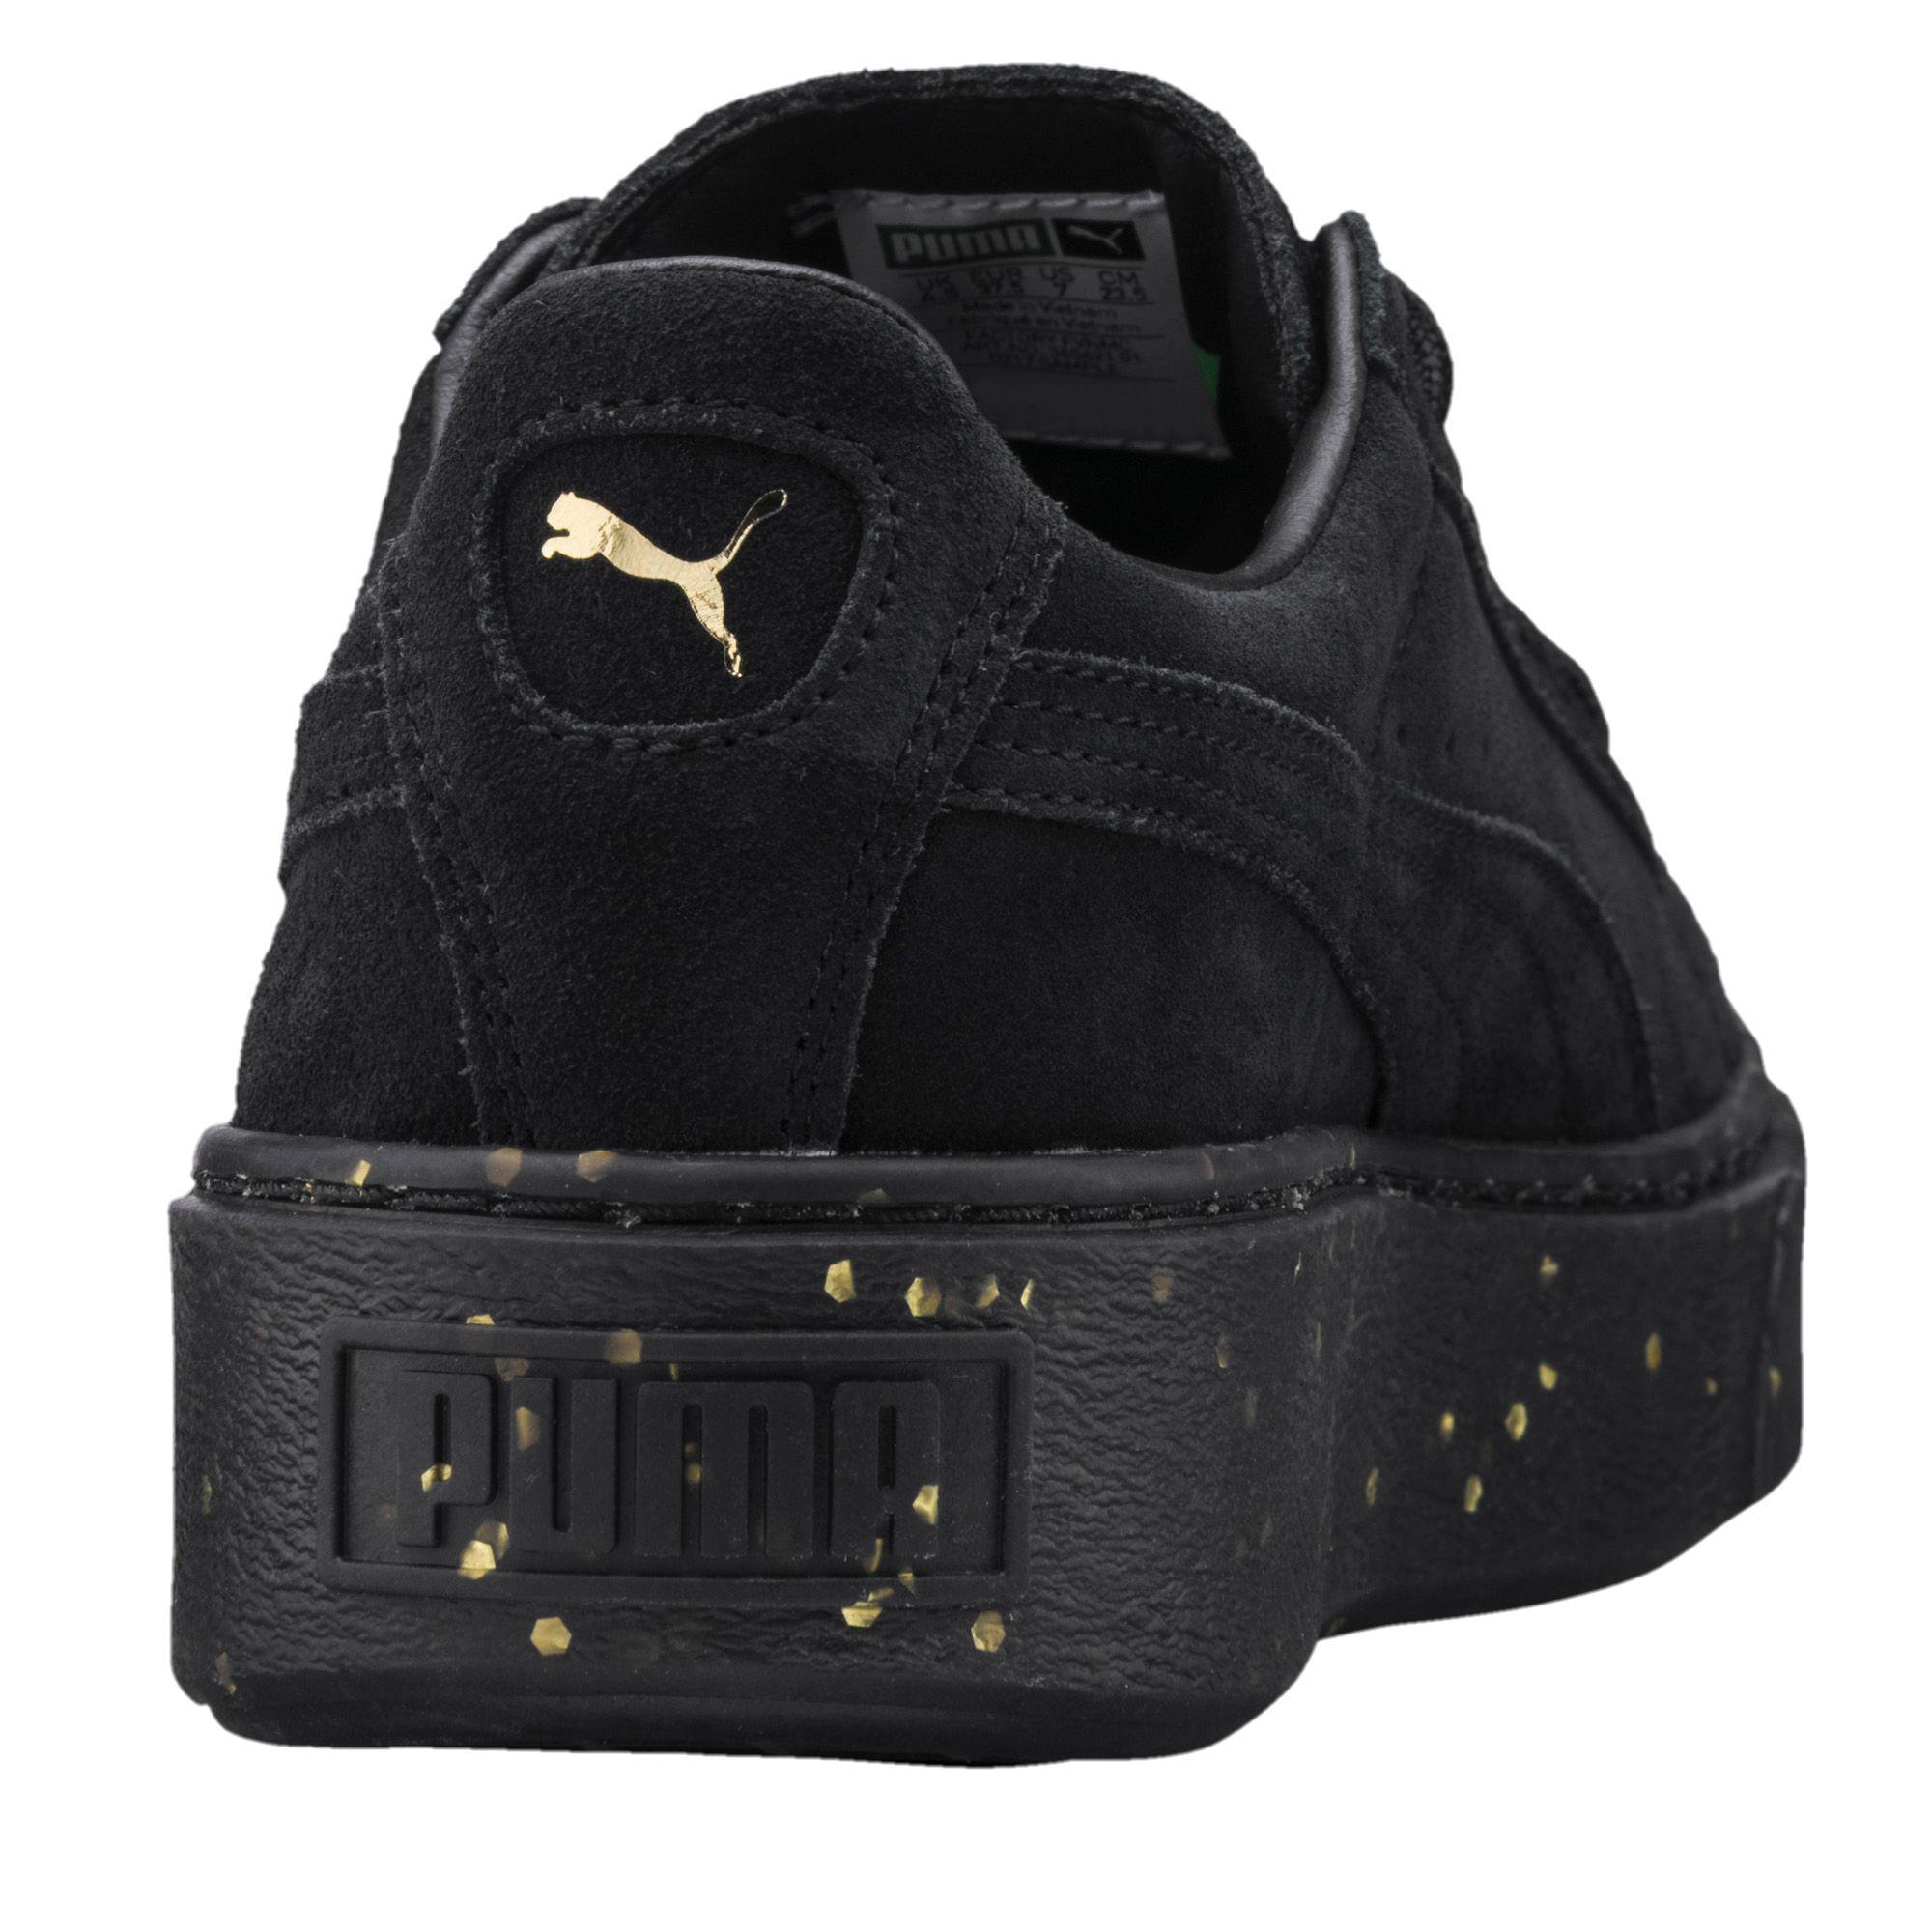 68099d93e21 Lyst - PUMA Suede Platform Celebrate Women s Sneakers in Black